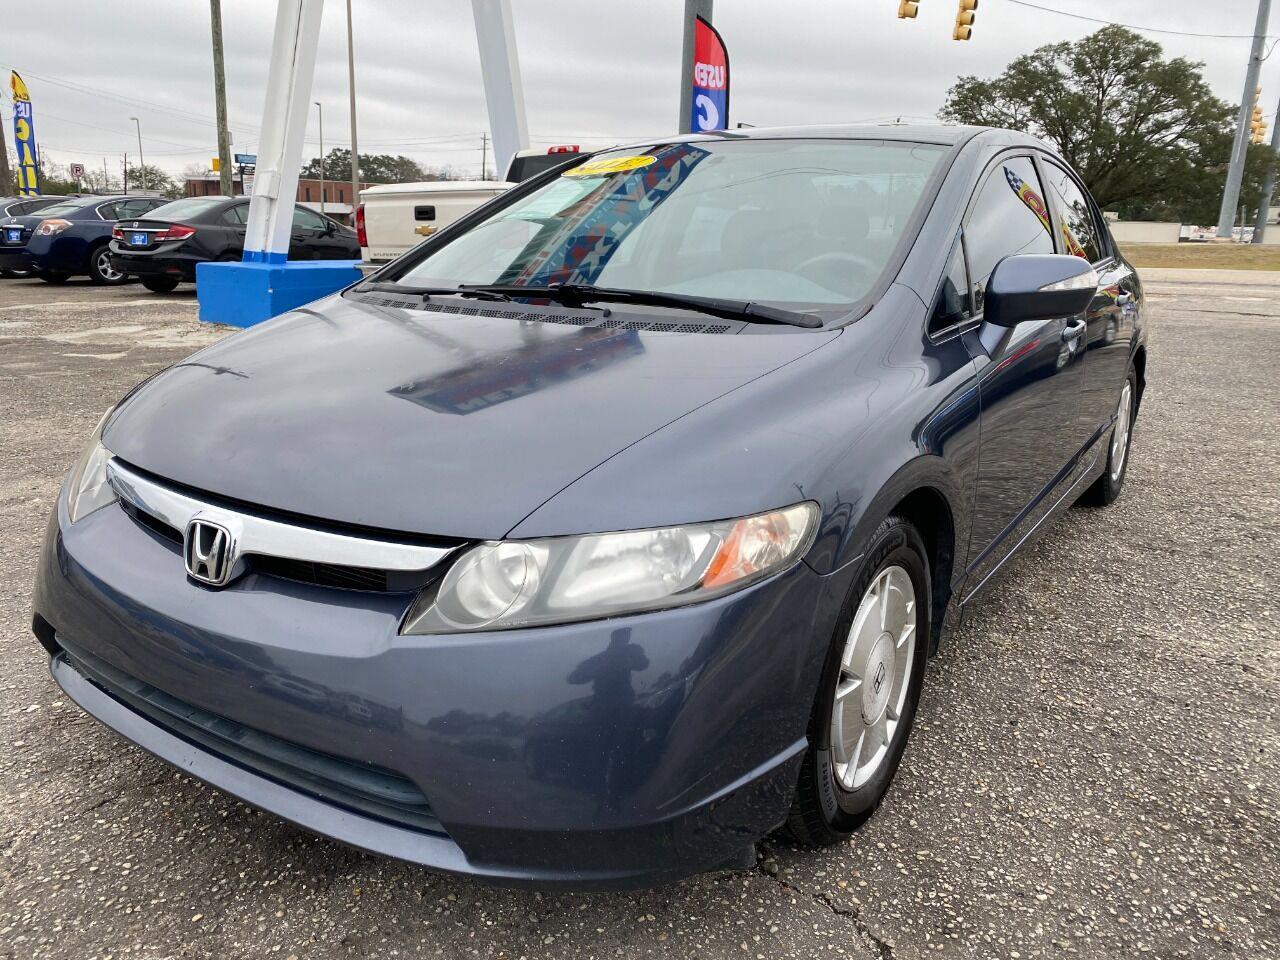 Used 2008 Honda Civic For Sale Carsforsale Com